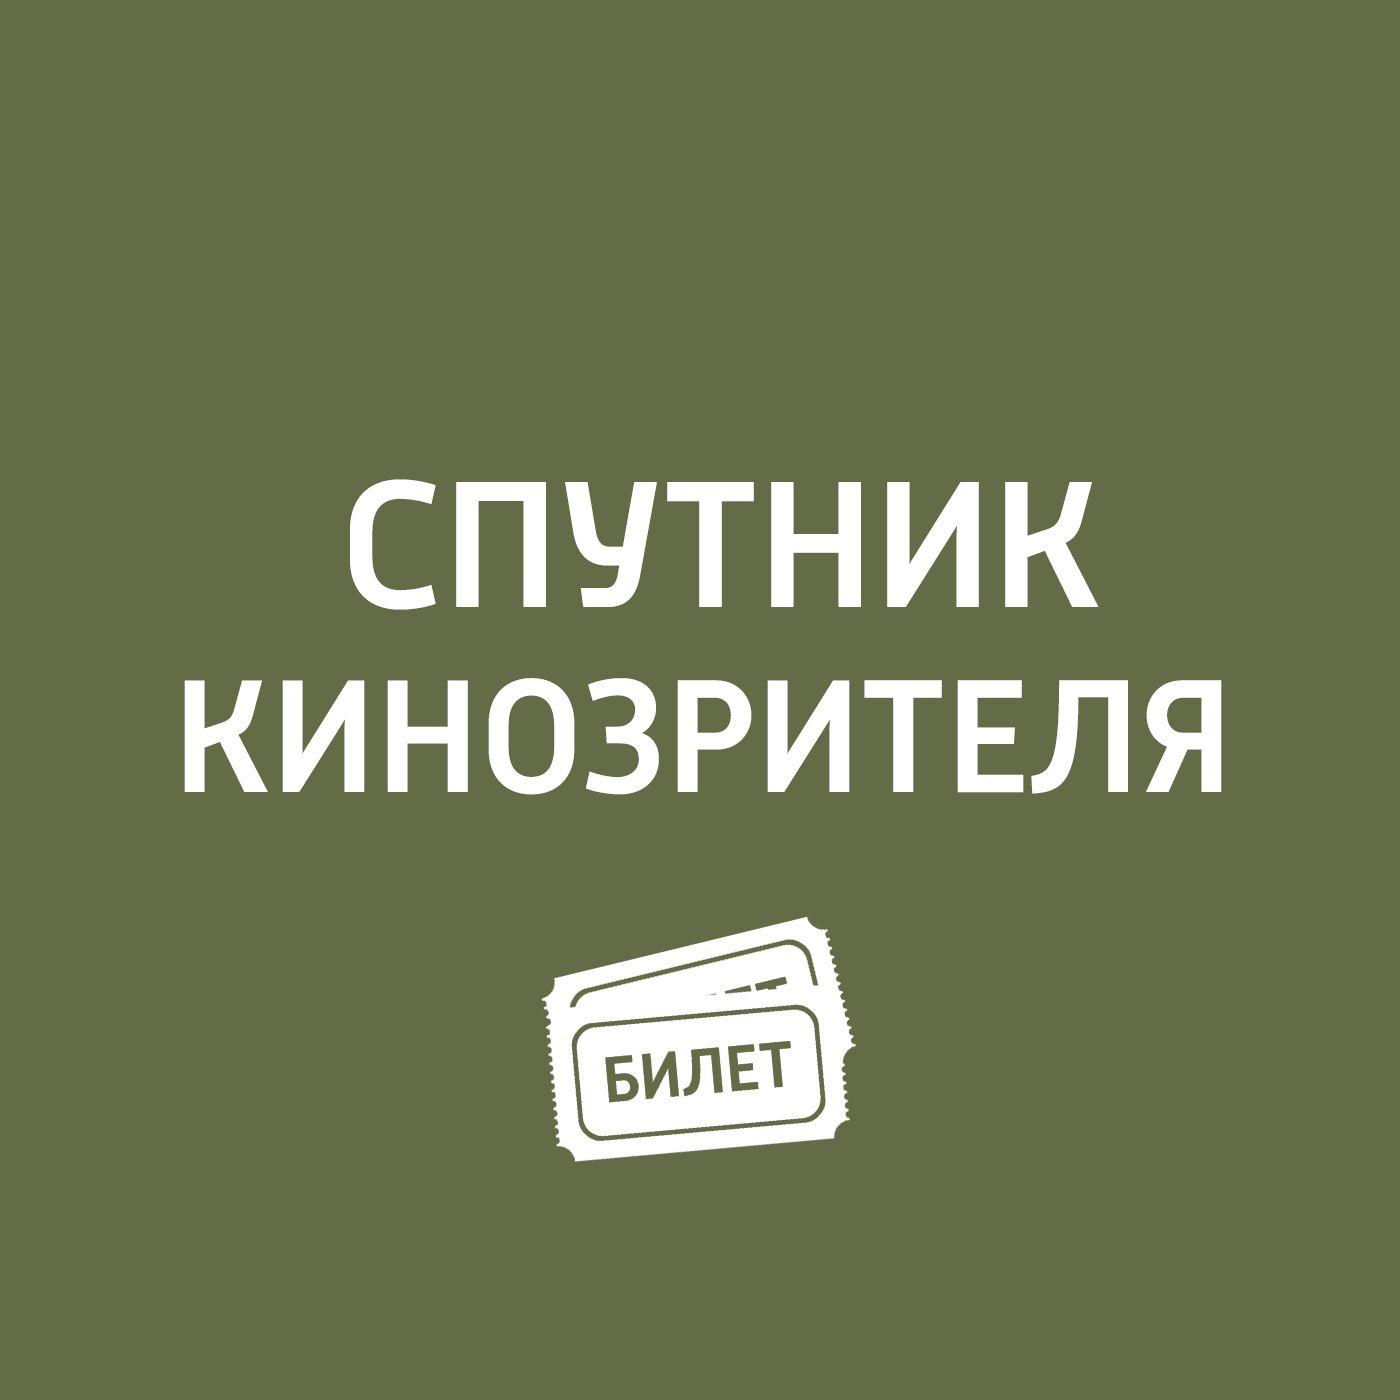 Антон Долин Фестиваль «Искусства кино» и «Москино» printio москино